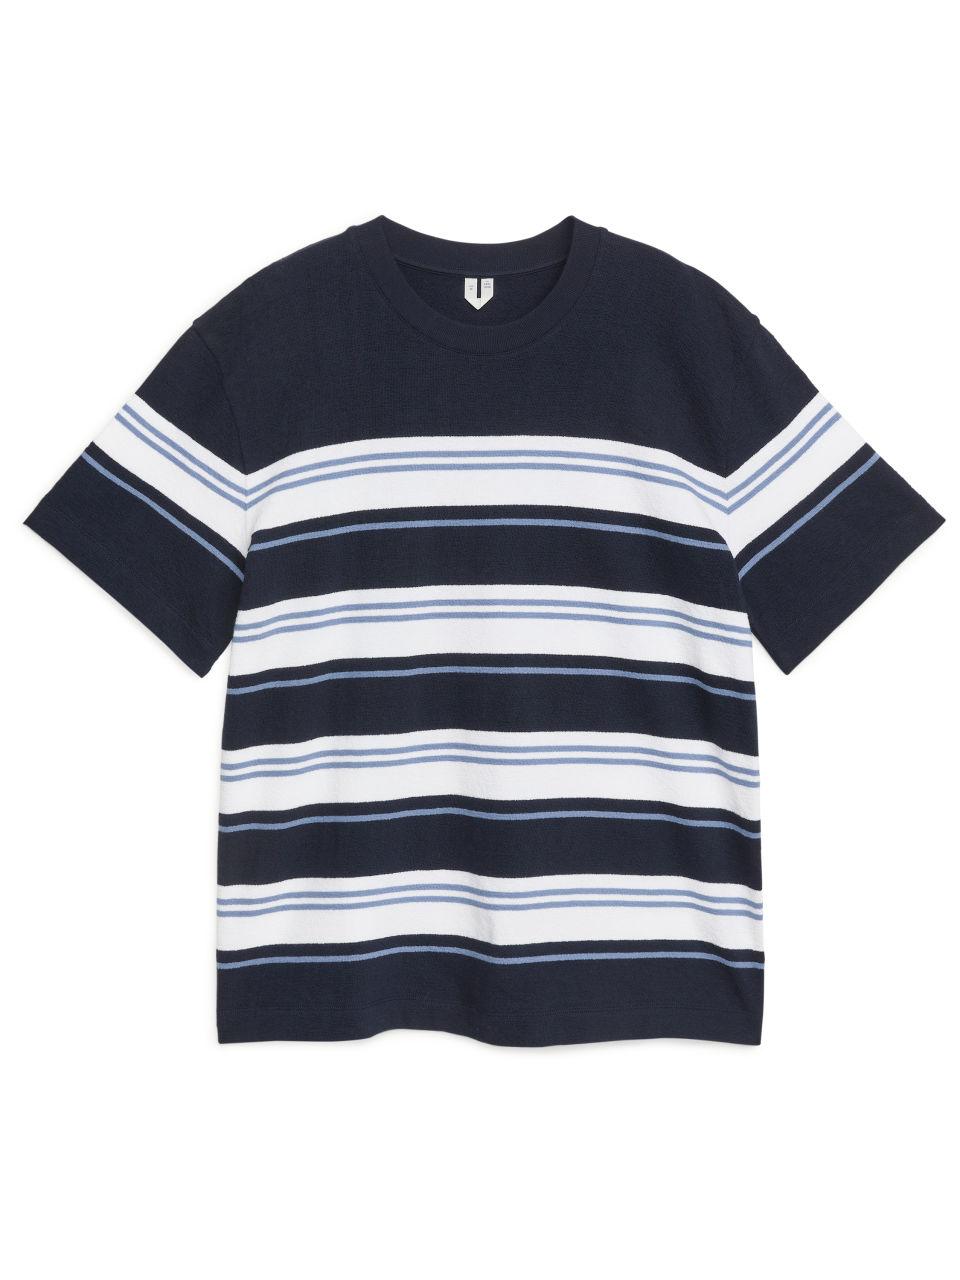 Oversized Bouclé T-Shirt - Blue